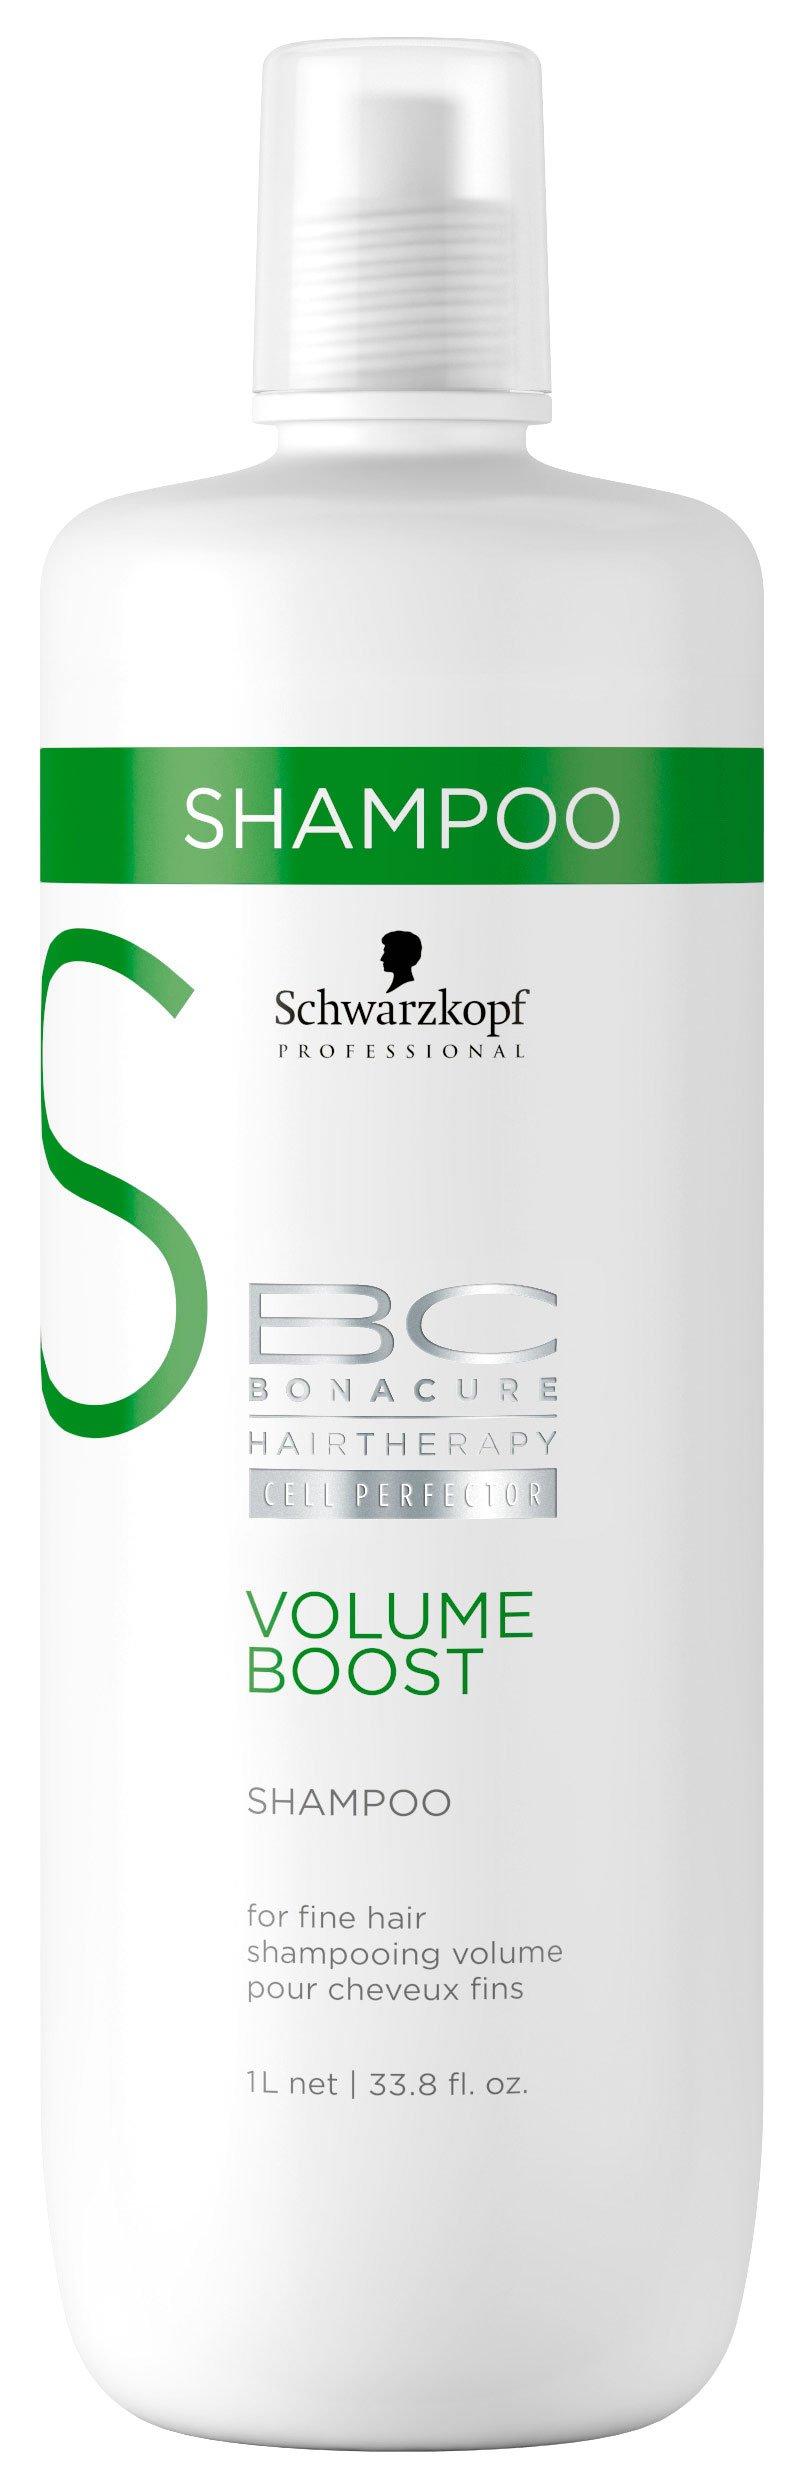 BC Bonacure VOLUME BOOST Shampoo, 33.81-Ounce